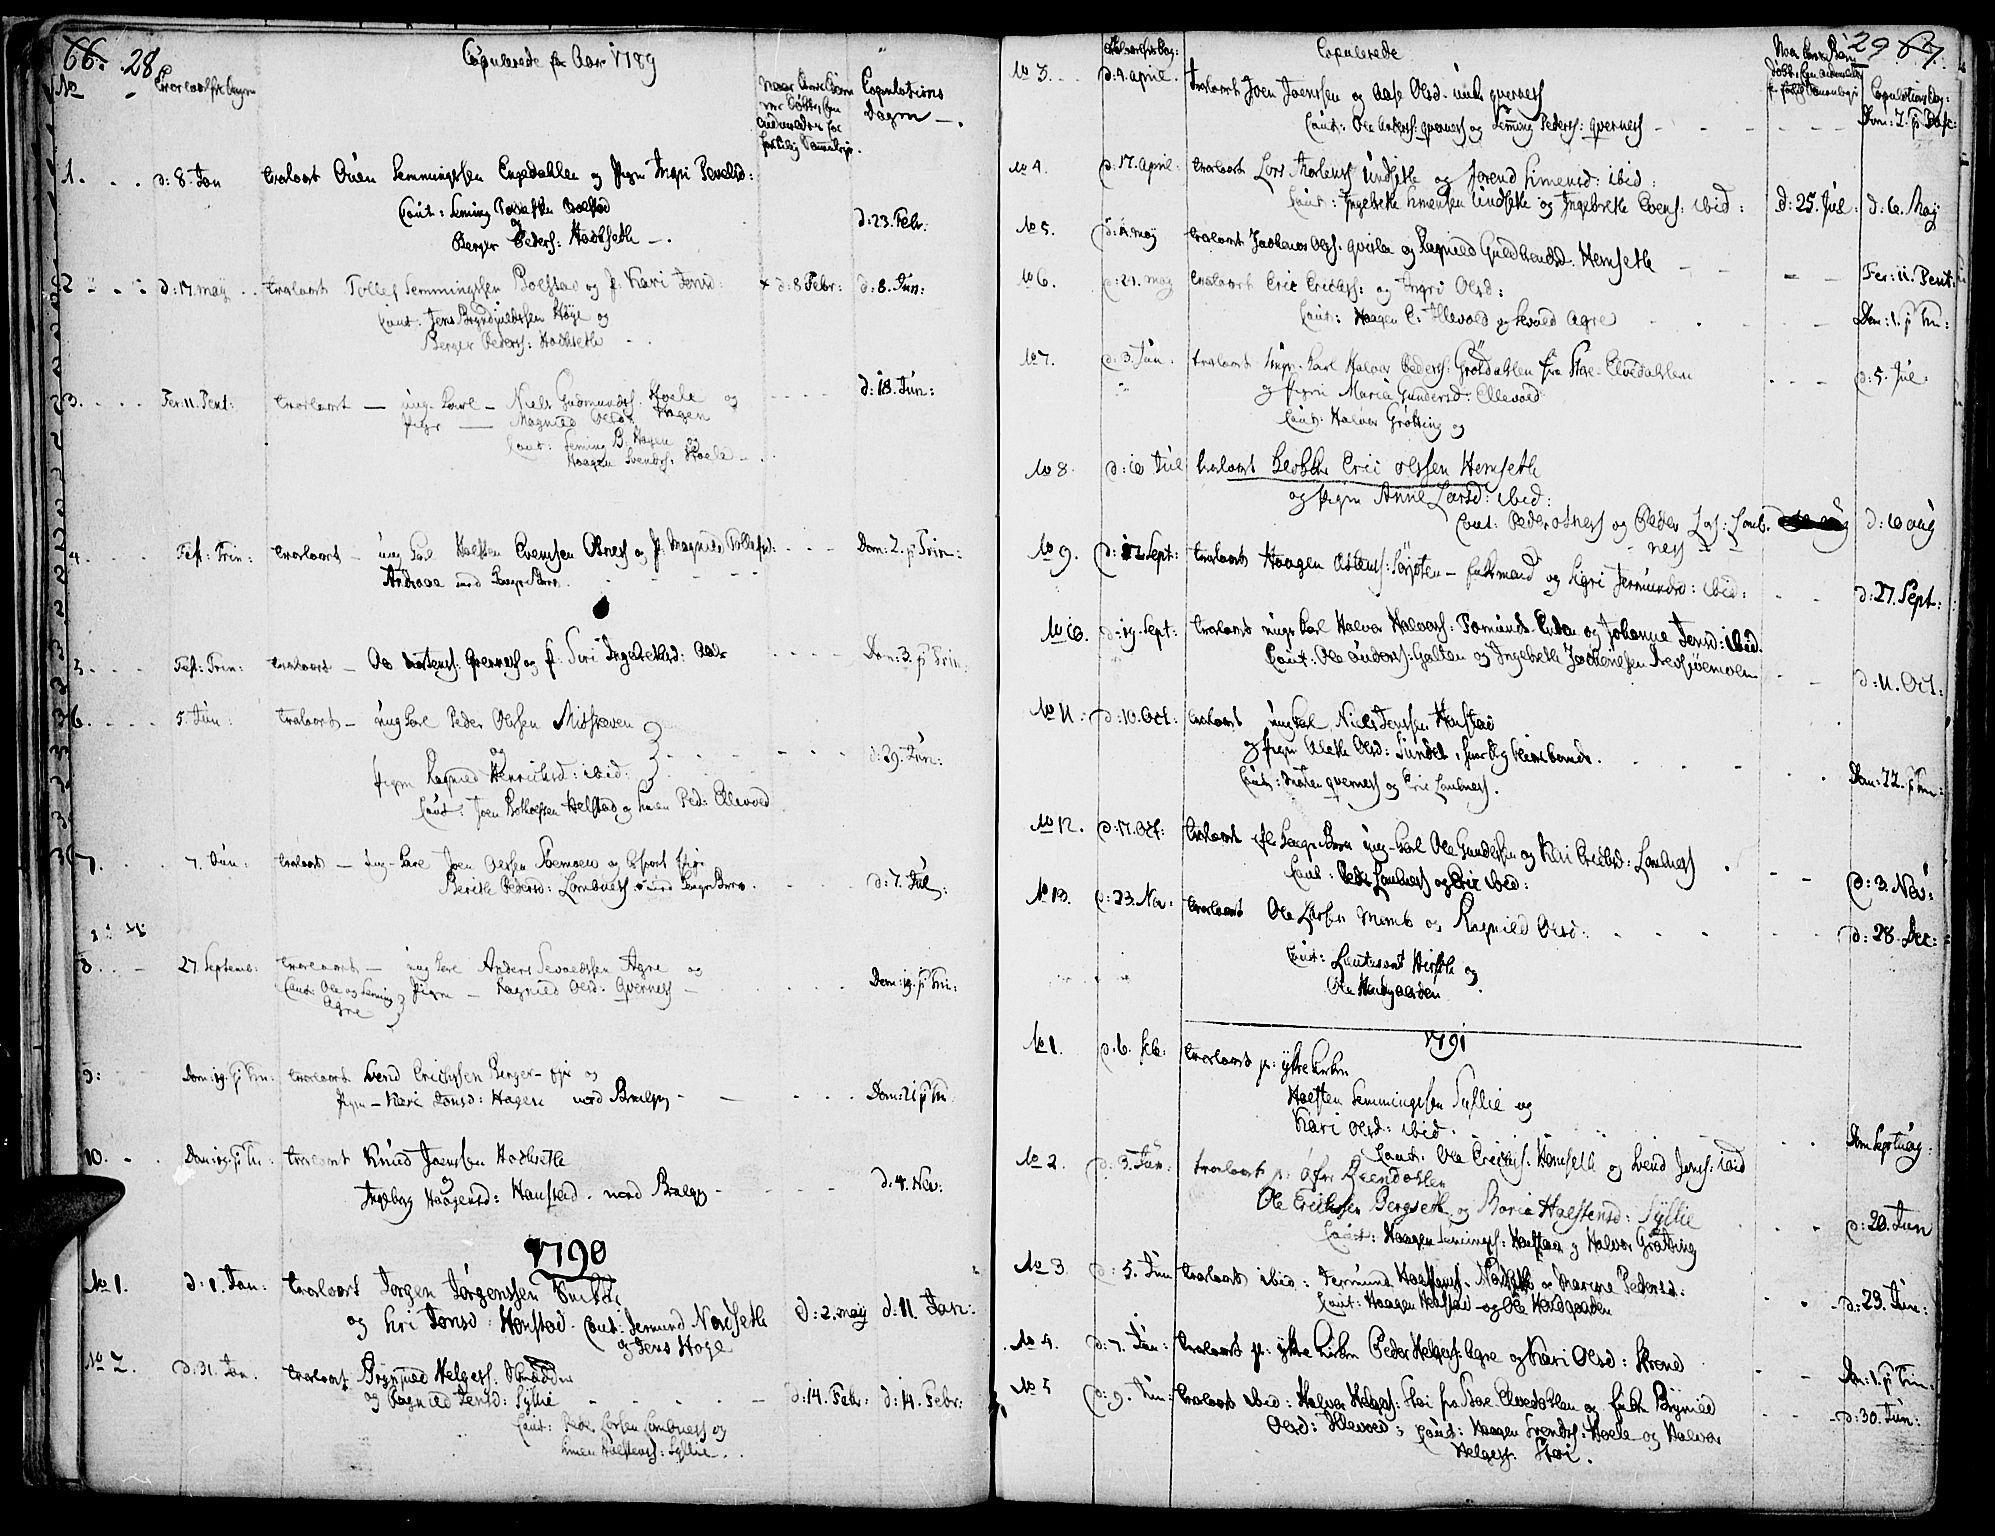 SAH, Rendalen prestekontor, H/Ha/Haa/L0002: Ministerialbok nr. 2, 1788-1814, s. 28-29